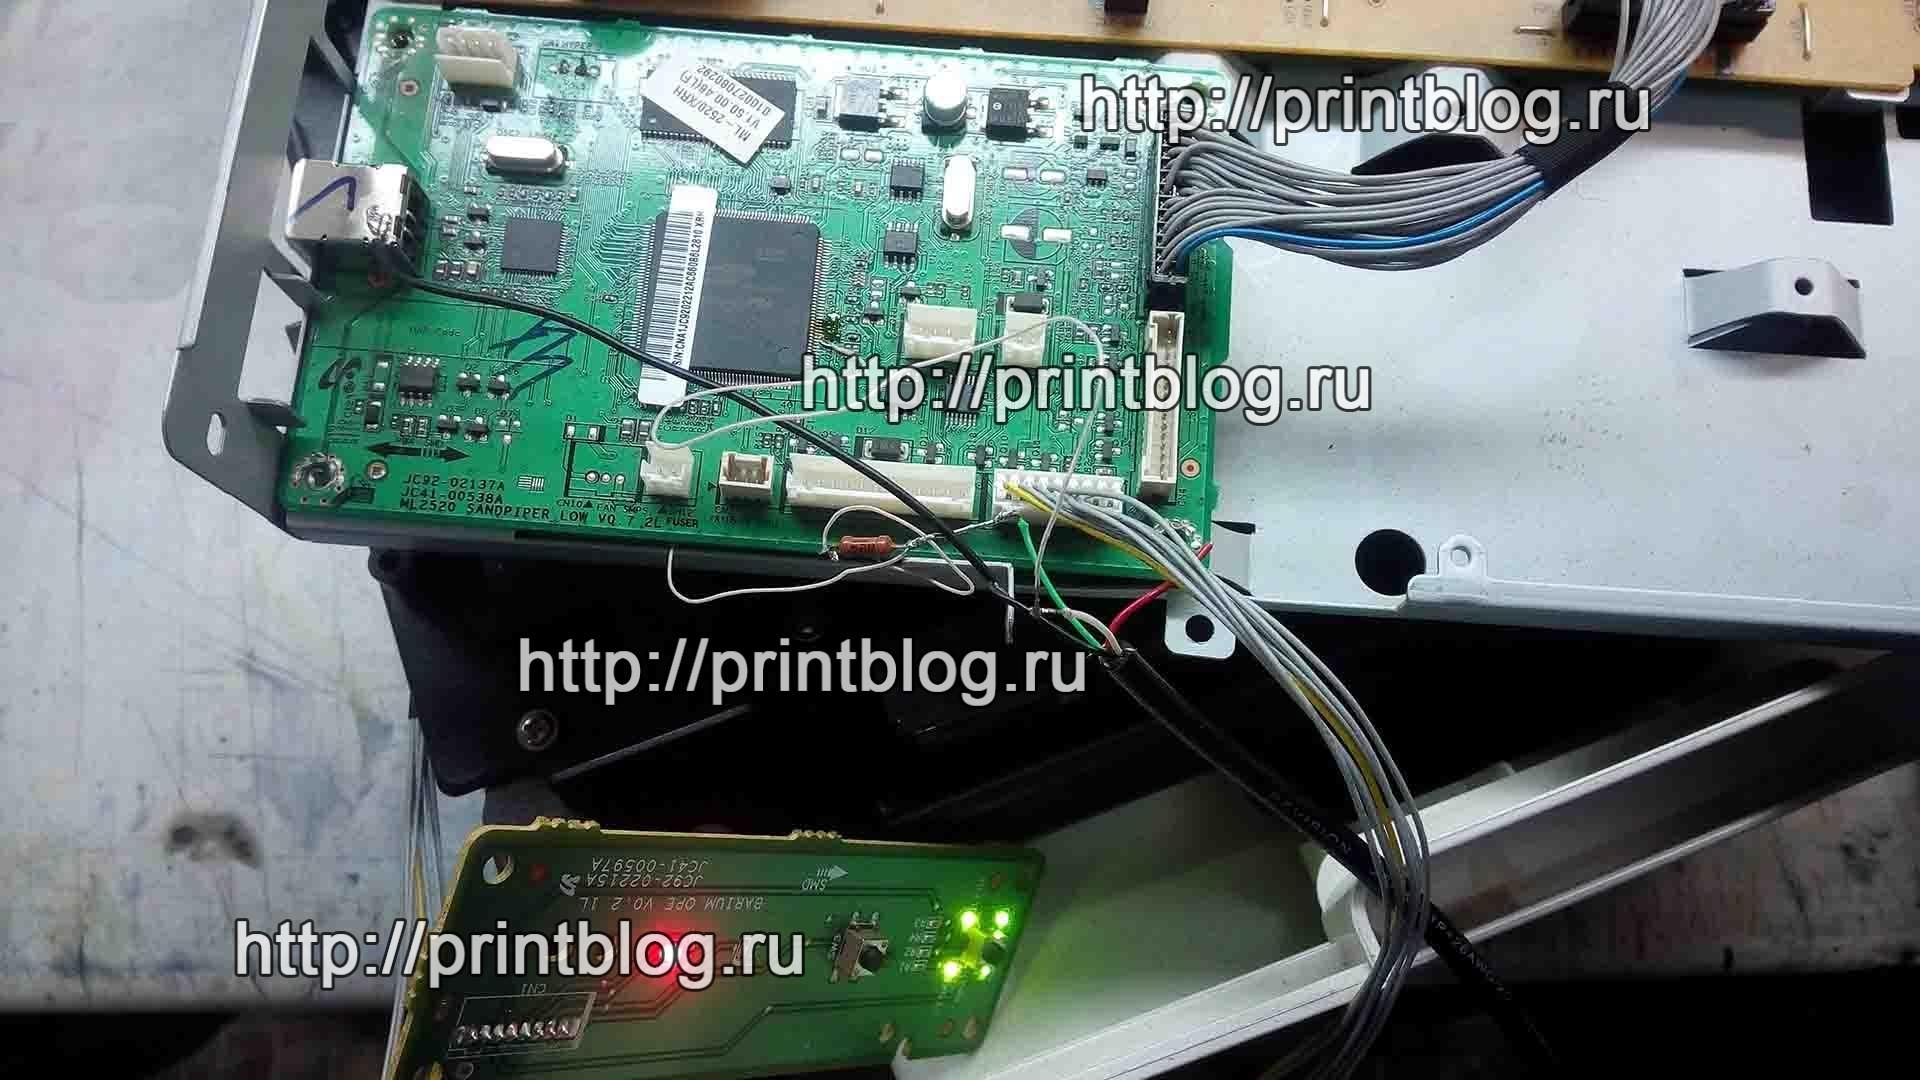 Схема подключения к процессору Jupiter4E Xerox 3155, Samsung ML-2525, ML-2520, ML-1910